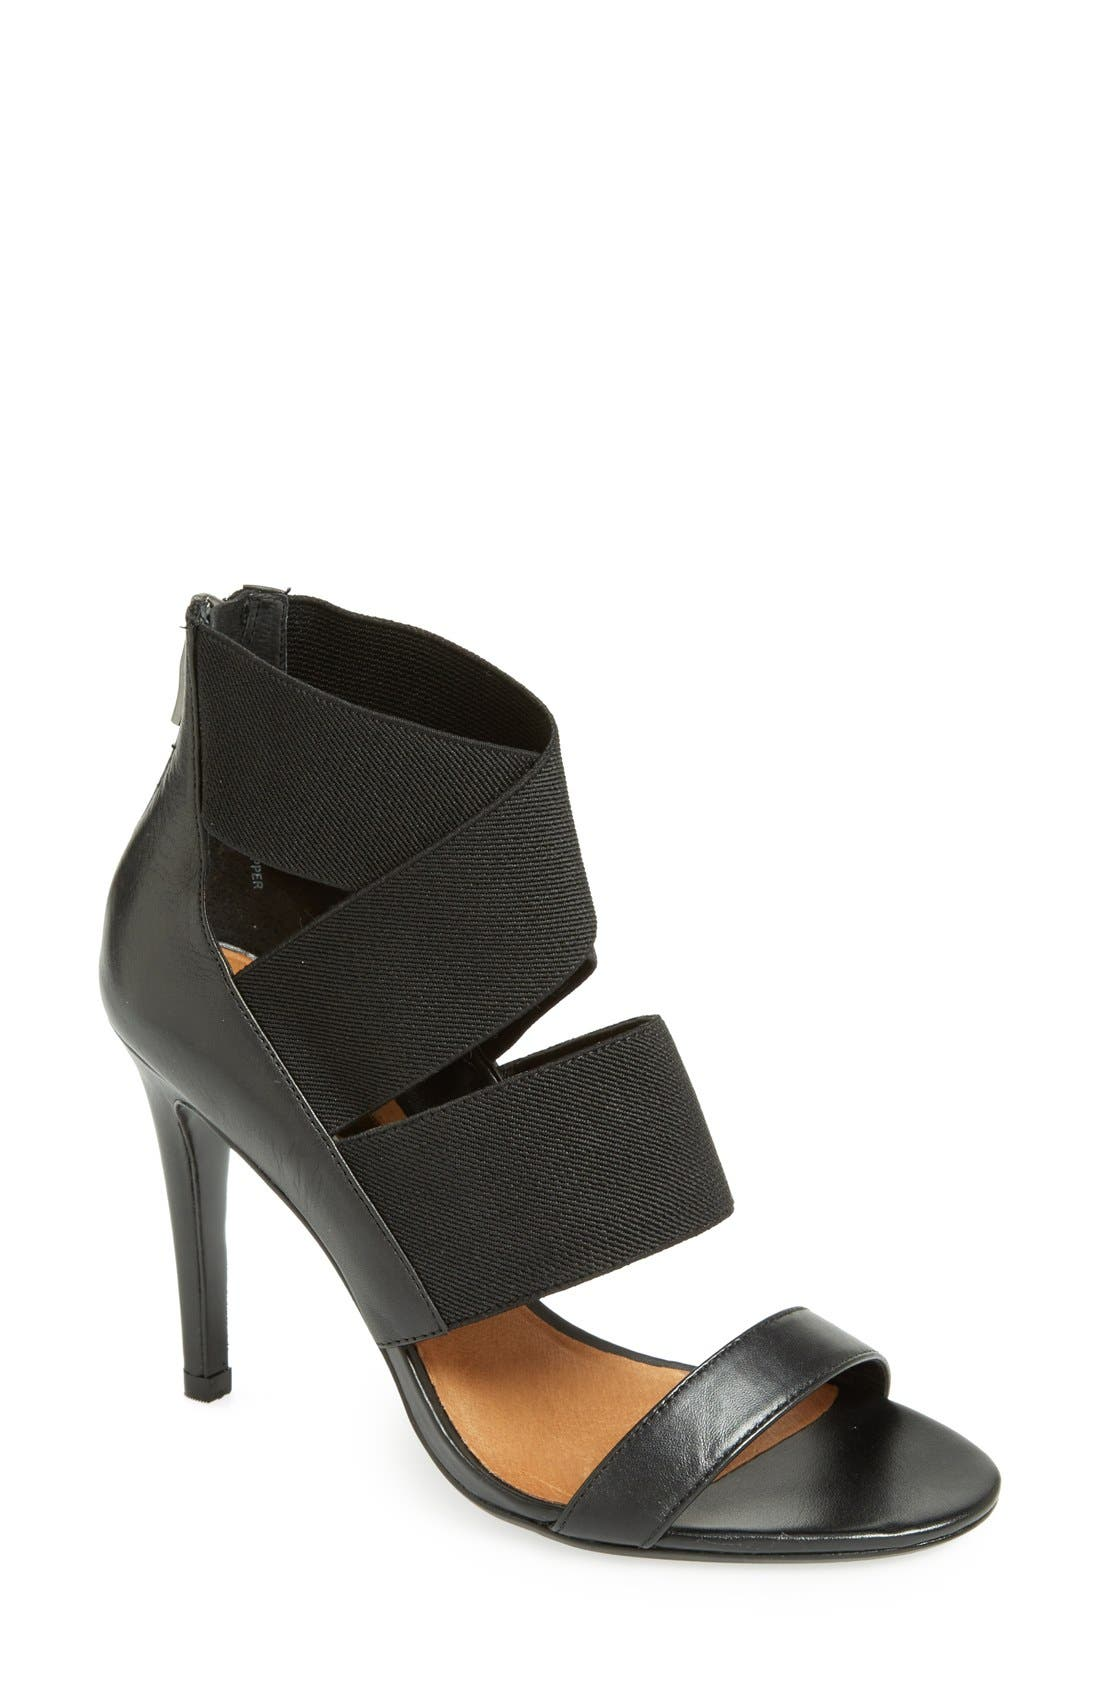 Alternate Image 1 Selected - Halogen® 'Katy' Sandal (Women)